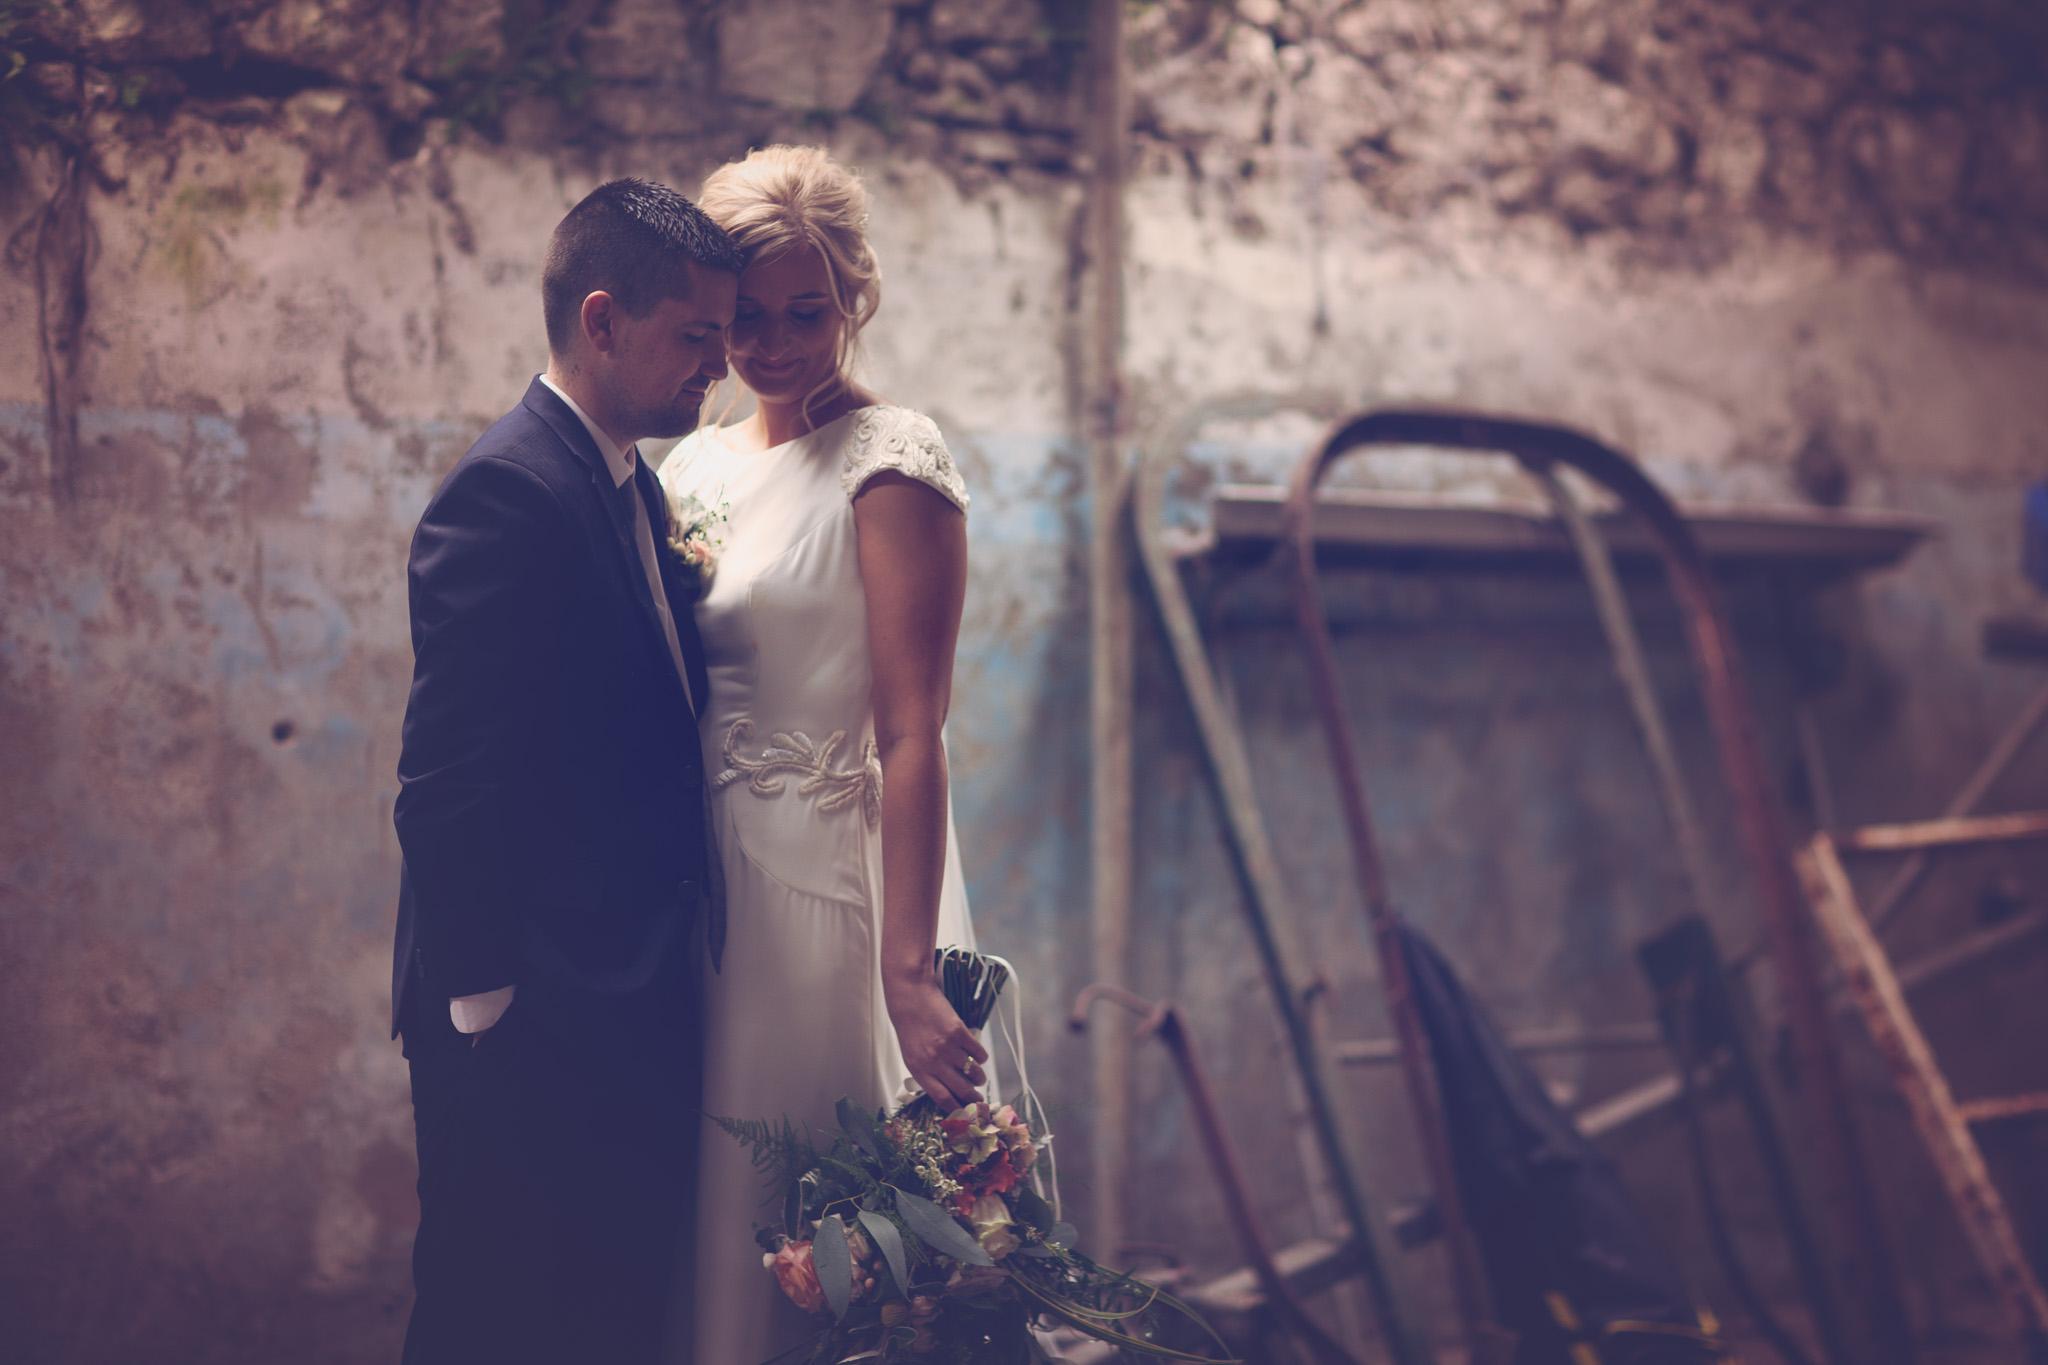 Mark_Barnes_Northern_Ireland_Wedding_Photography_Ballyscullion_Park_Wedding_Photography_Stef&Bobby-33.jpg